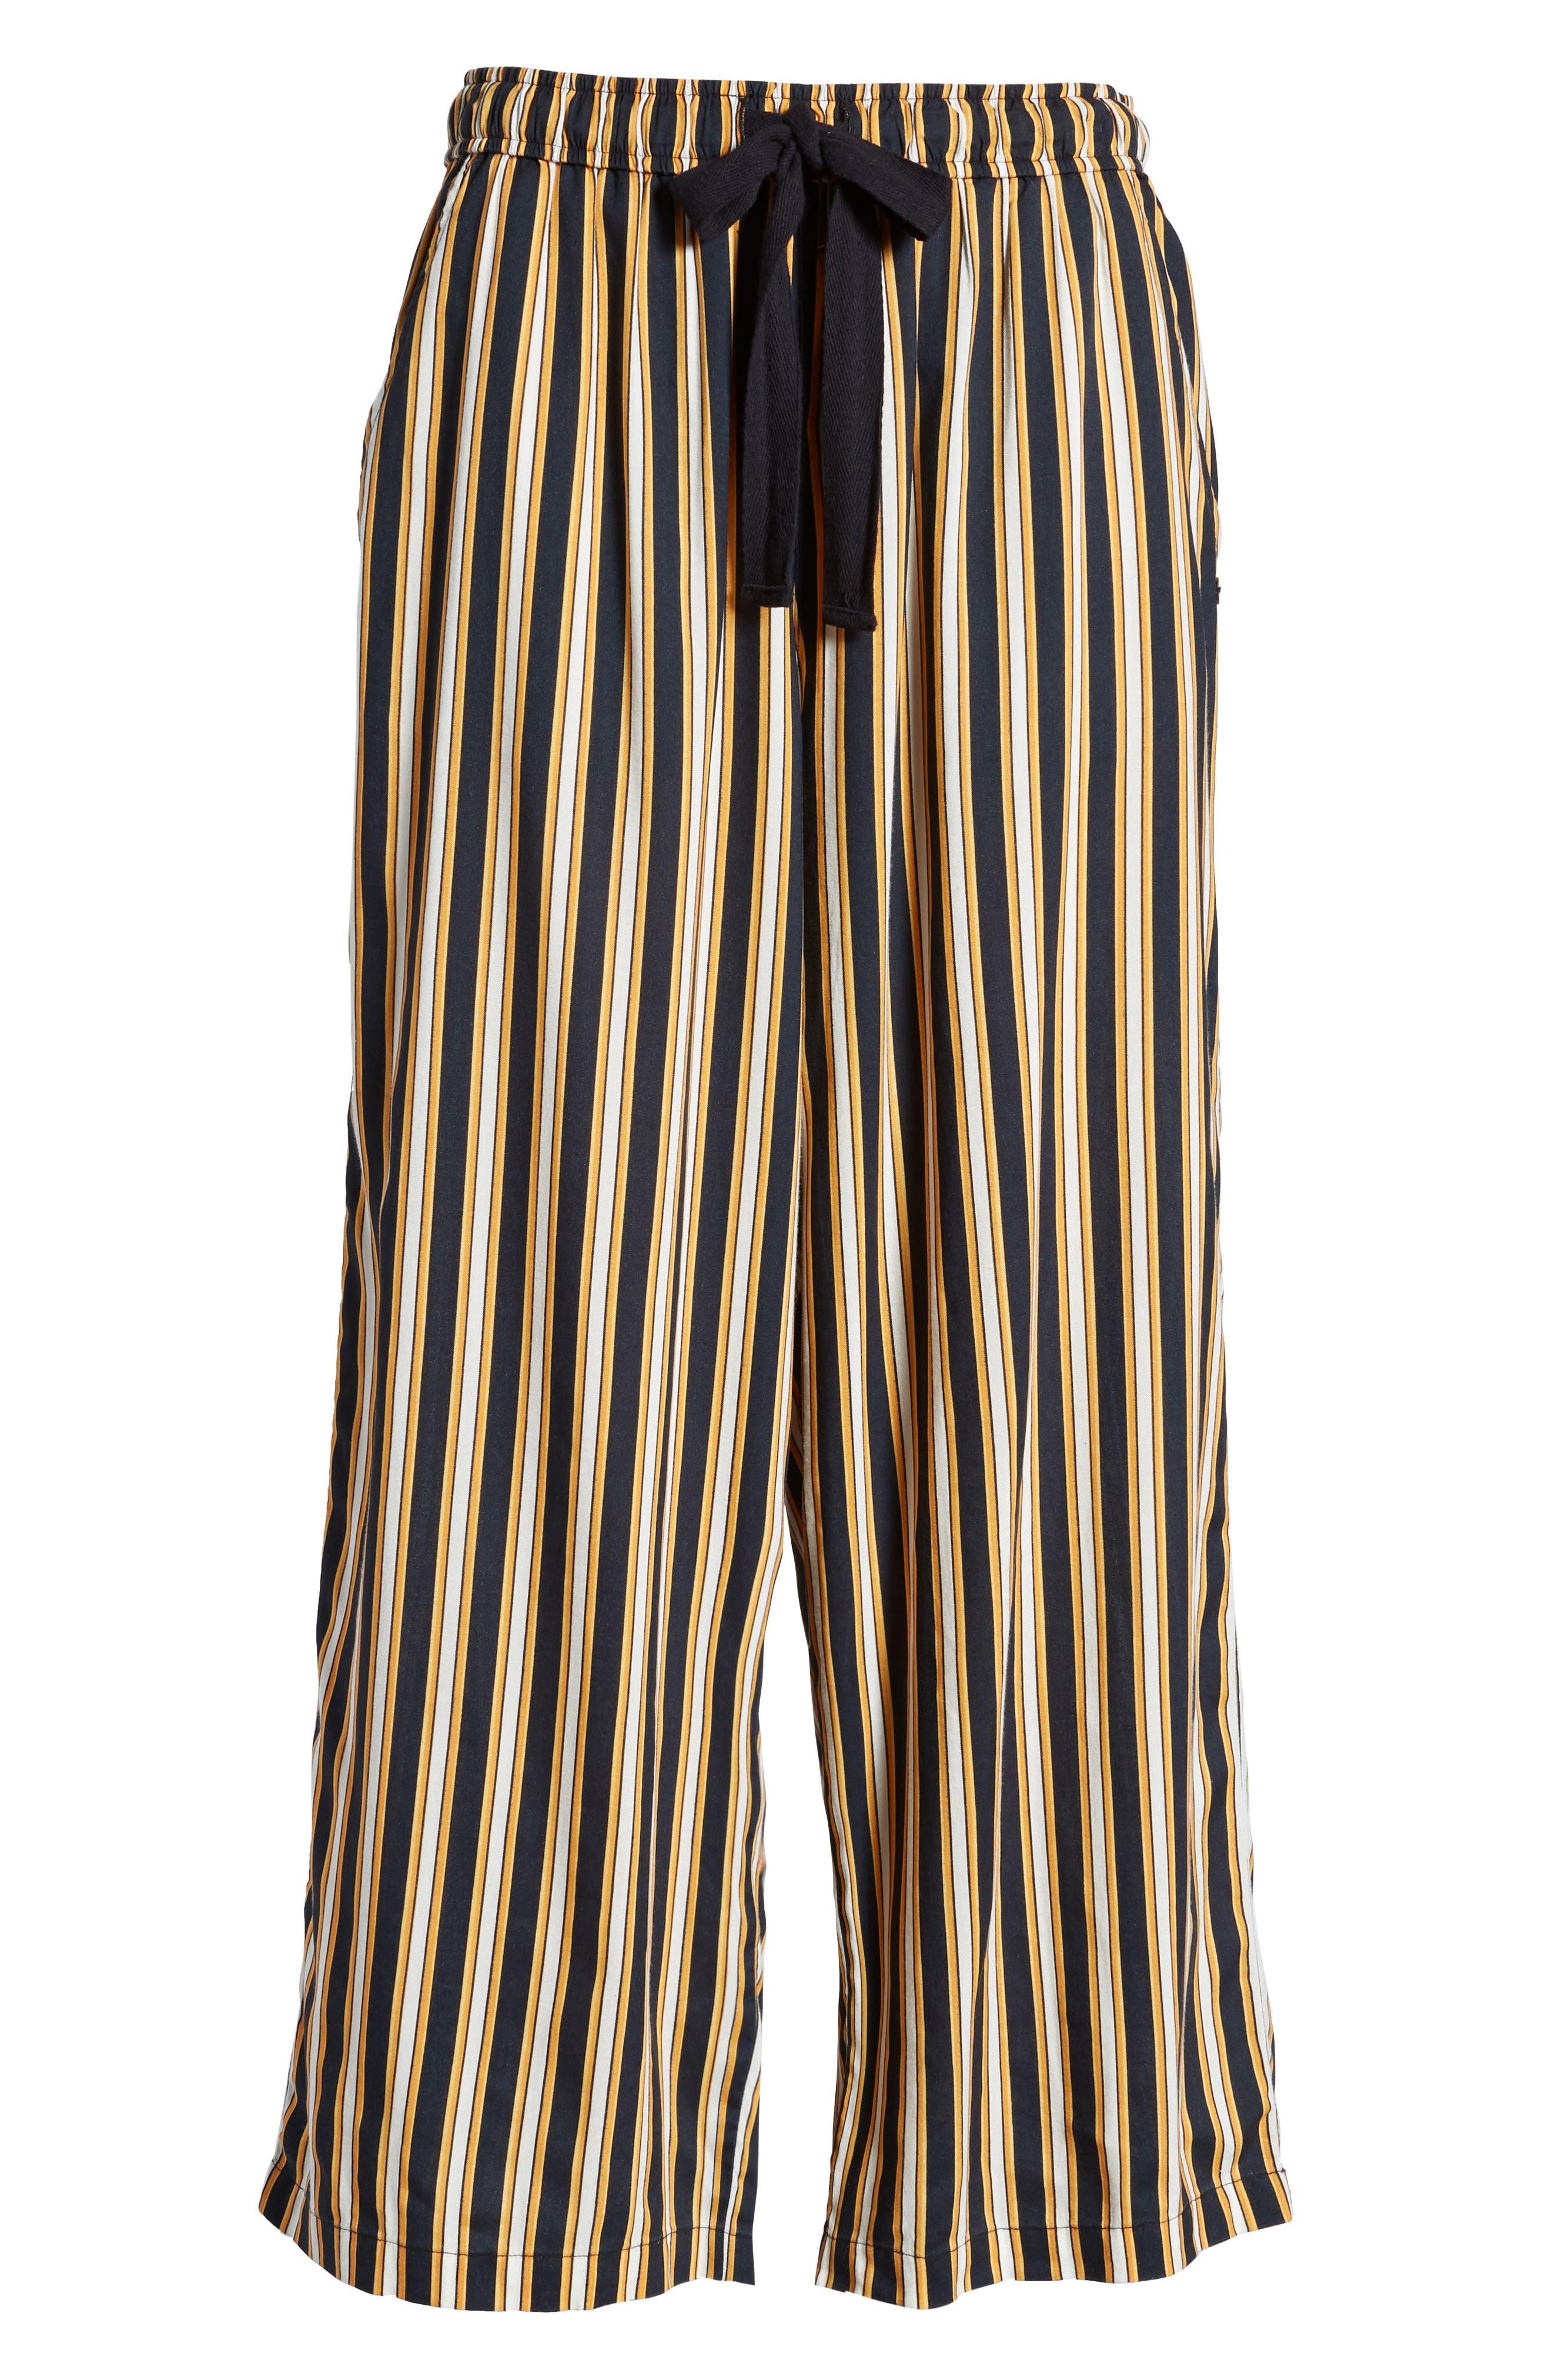 Stoney Stripe Pants,                             Alternate thumbnail 8, color,                             Navy Sea